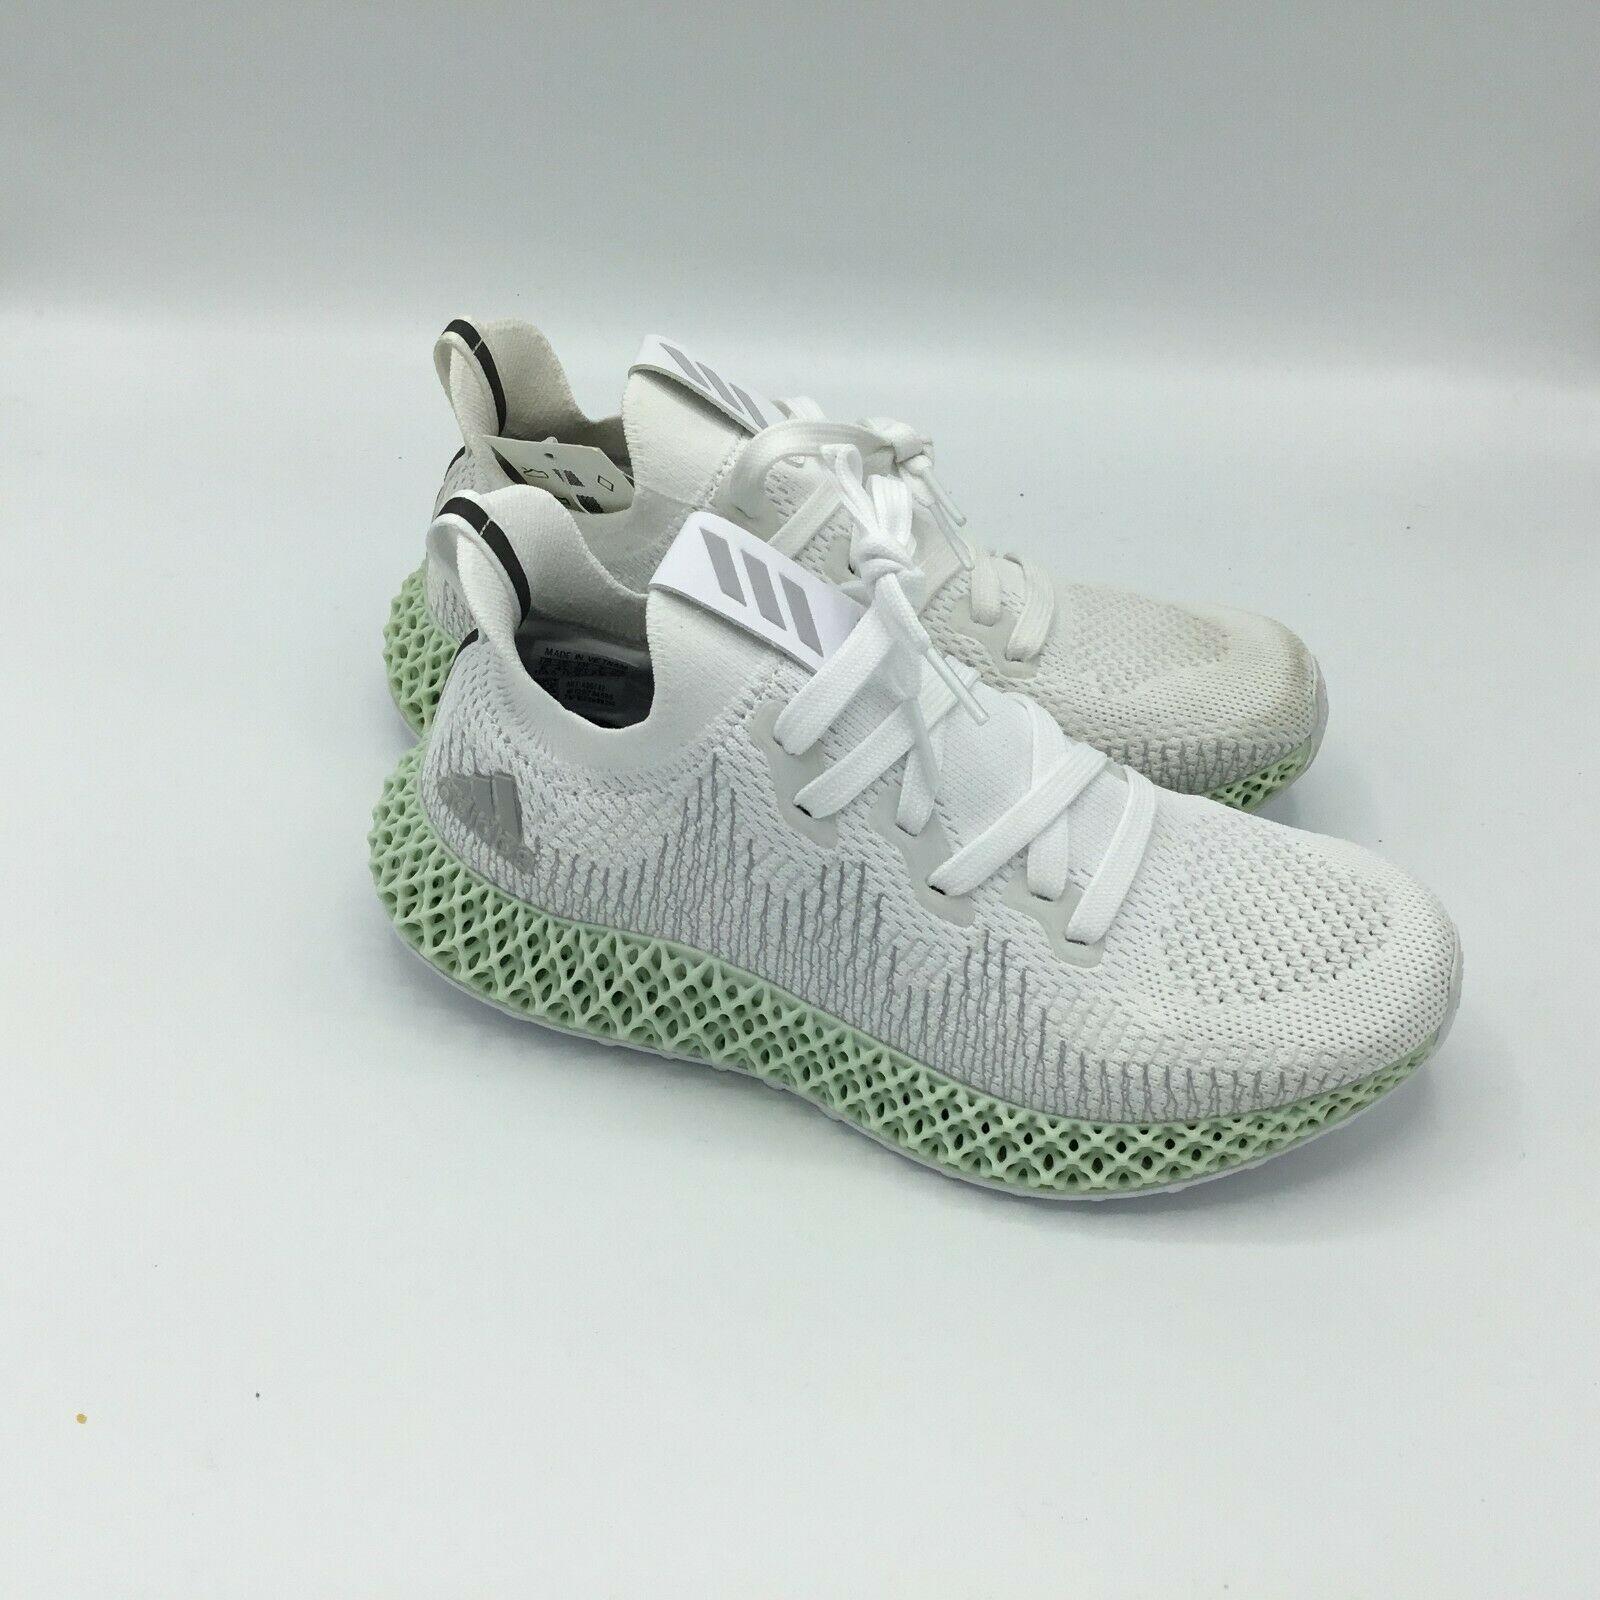 Adidas Alphaedge 4D White W